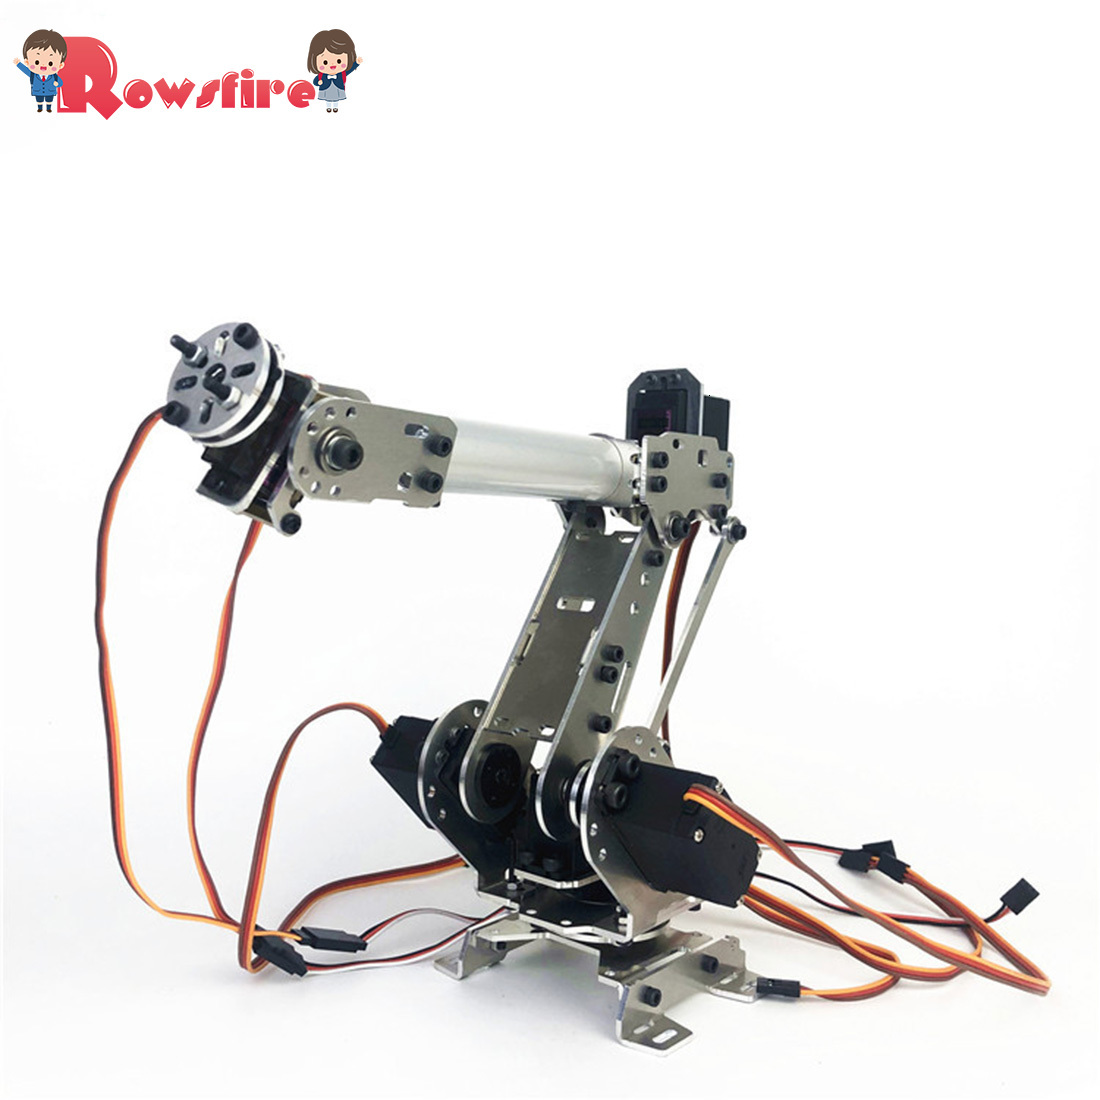 DIY 6DOF Mechanical Arm Robot Kit ABB Industrial Robot Model